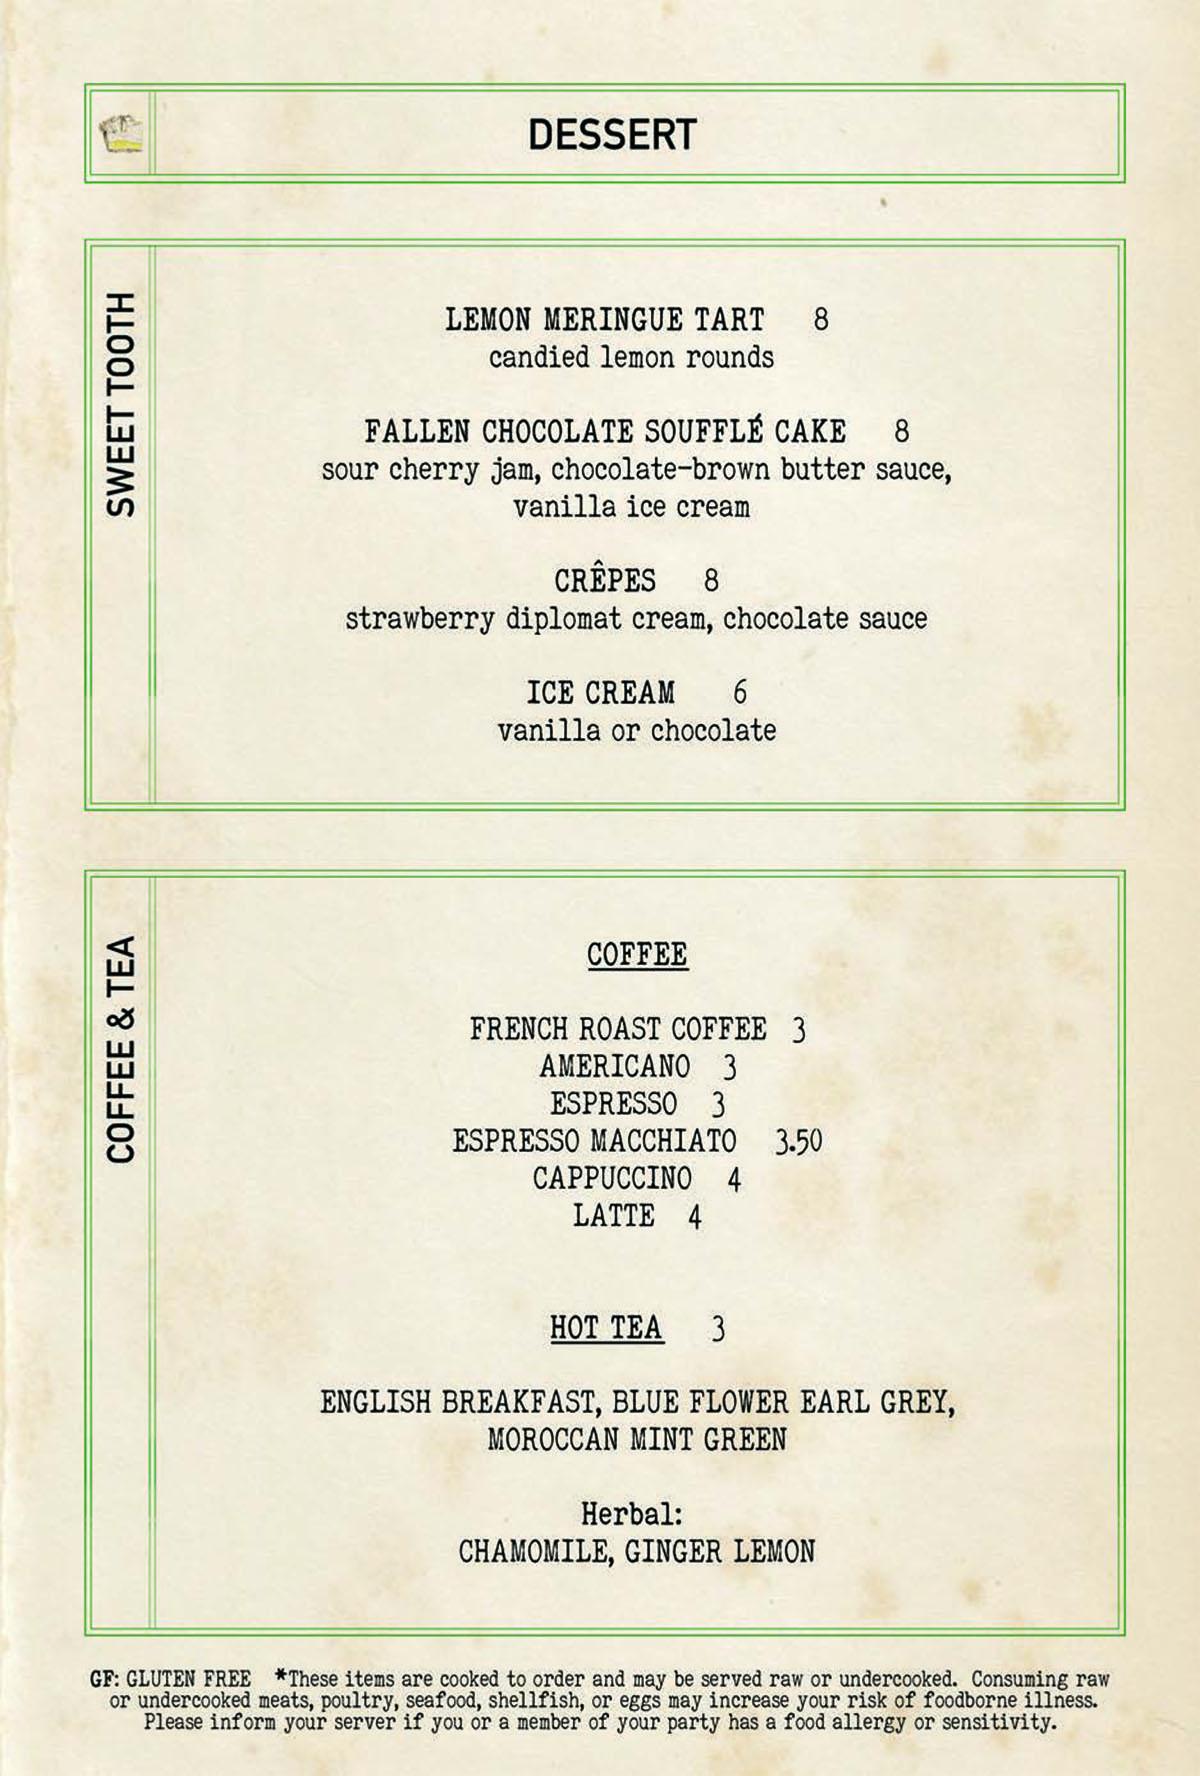 Bar Mercato dessert menu 1